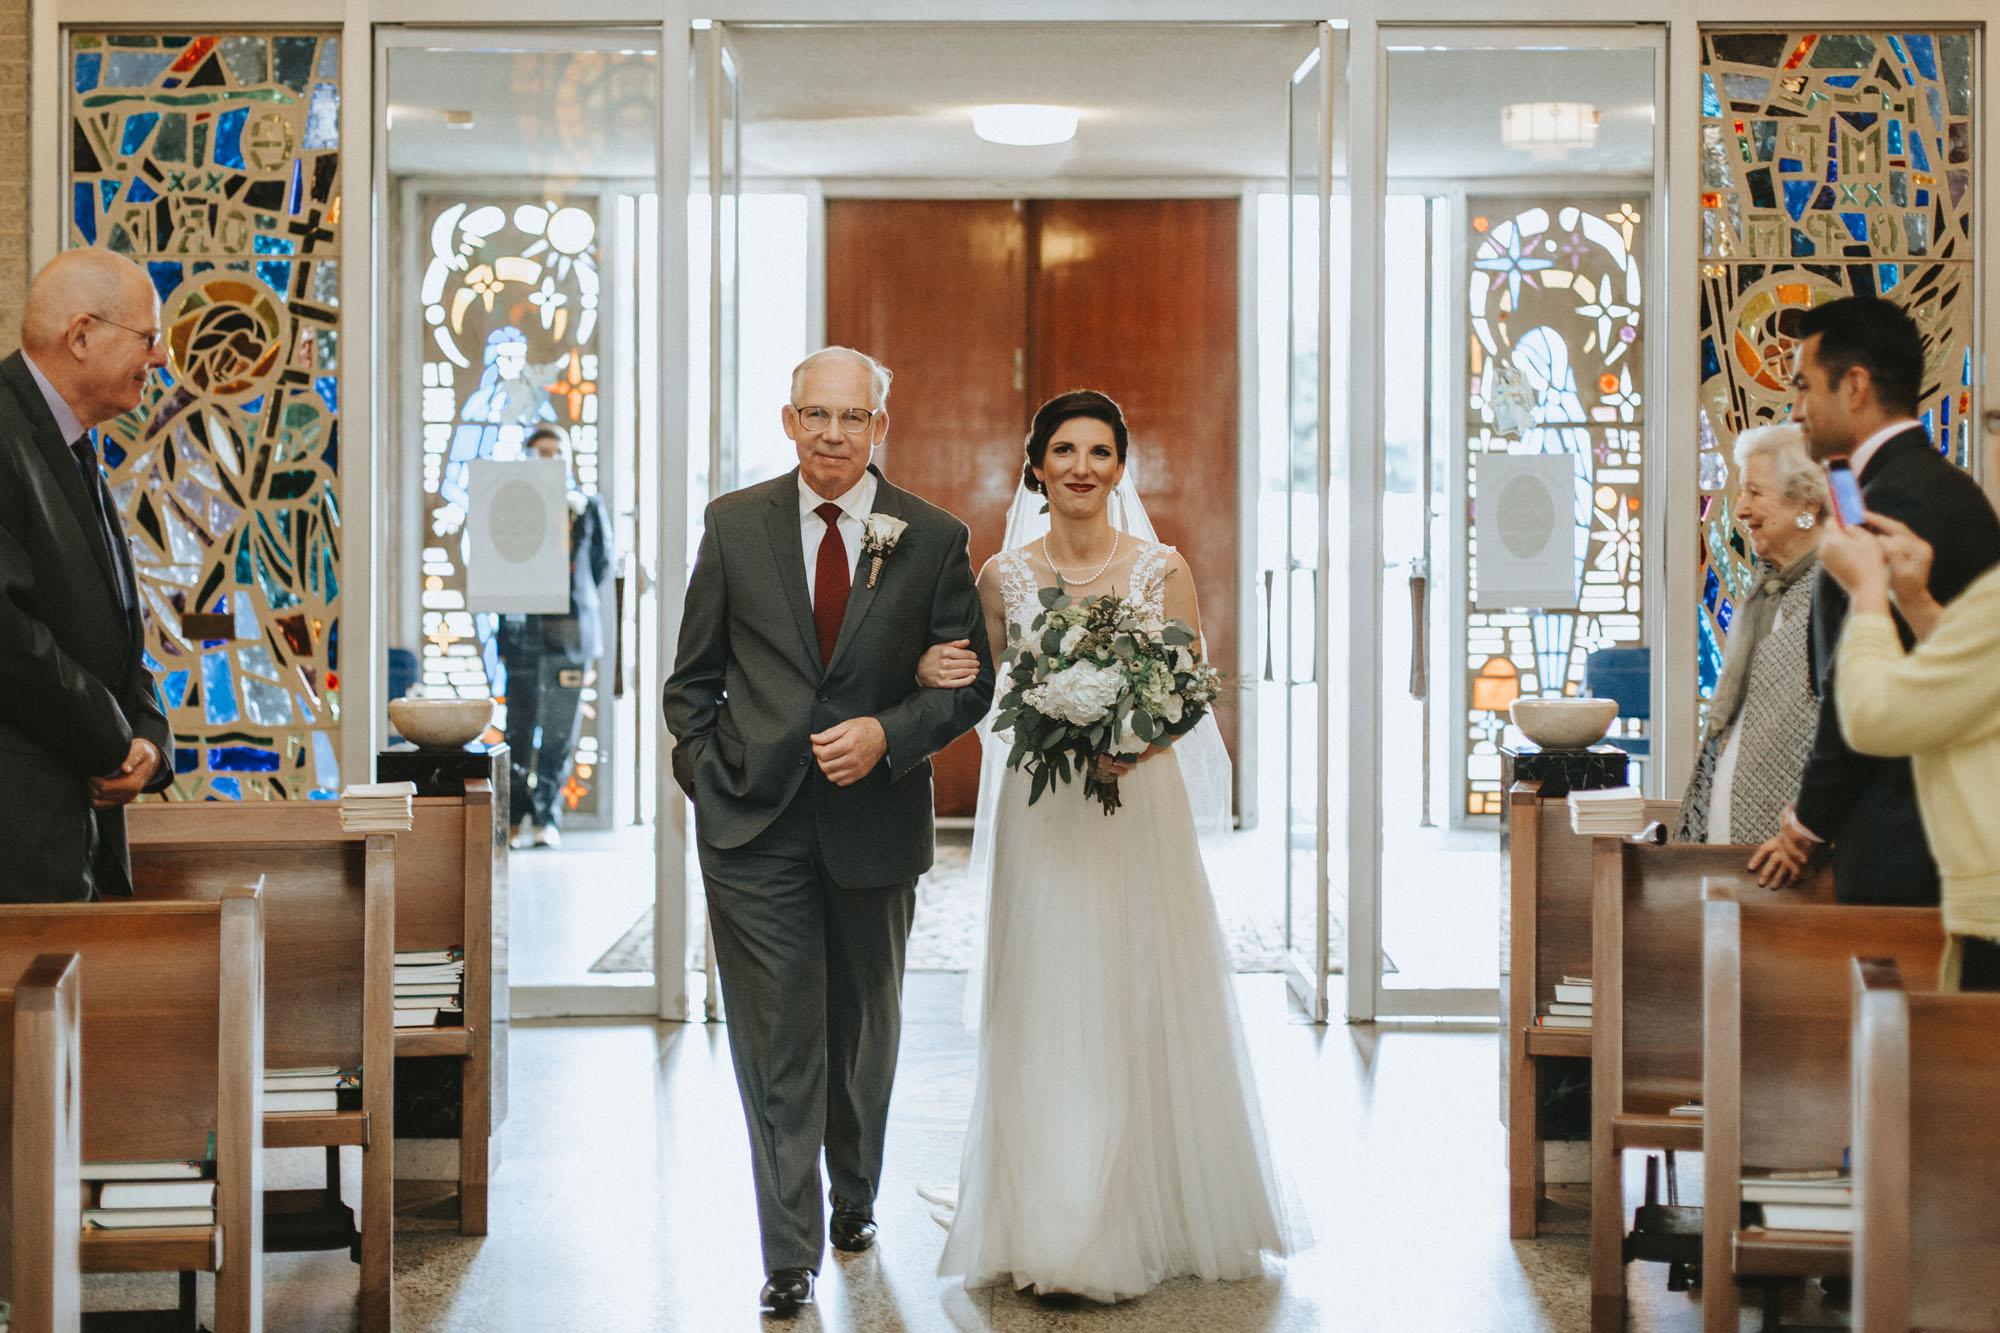 Twisted-Oaks-Studio-Arianne-Sean-Wedding-69.jpg